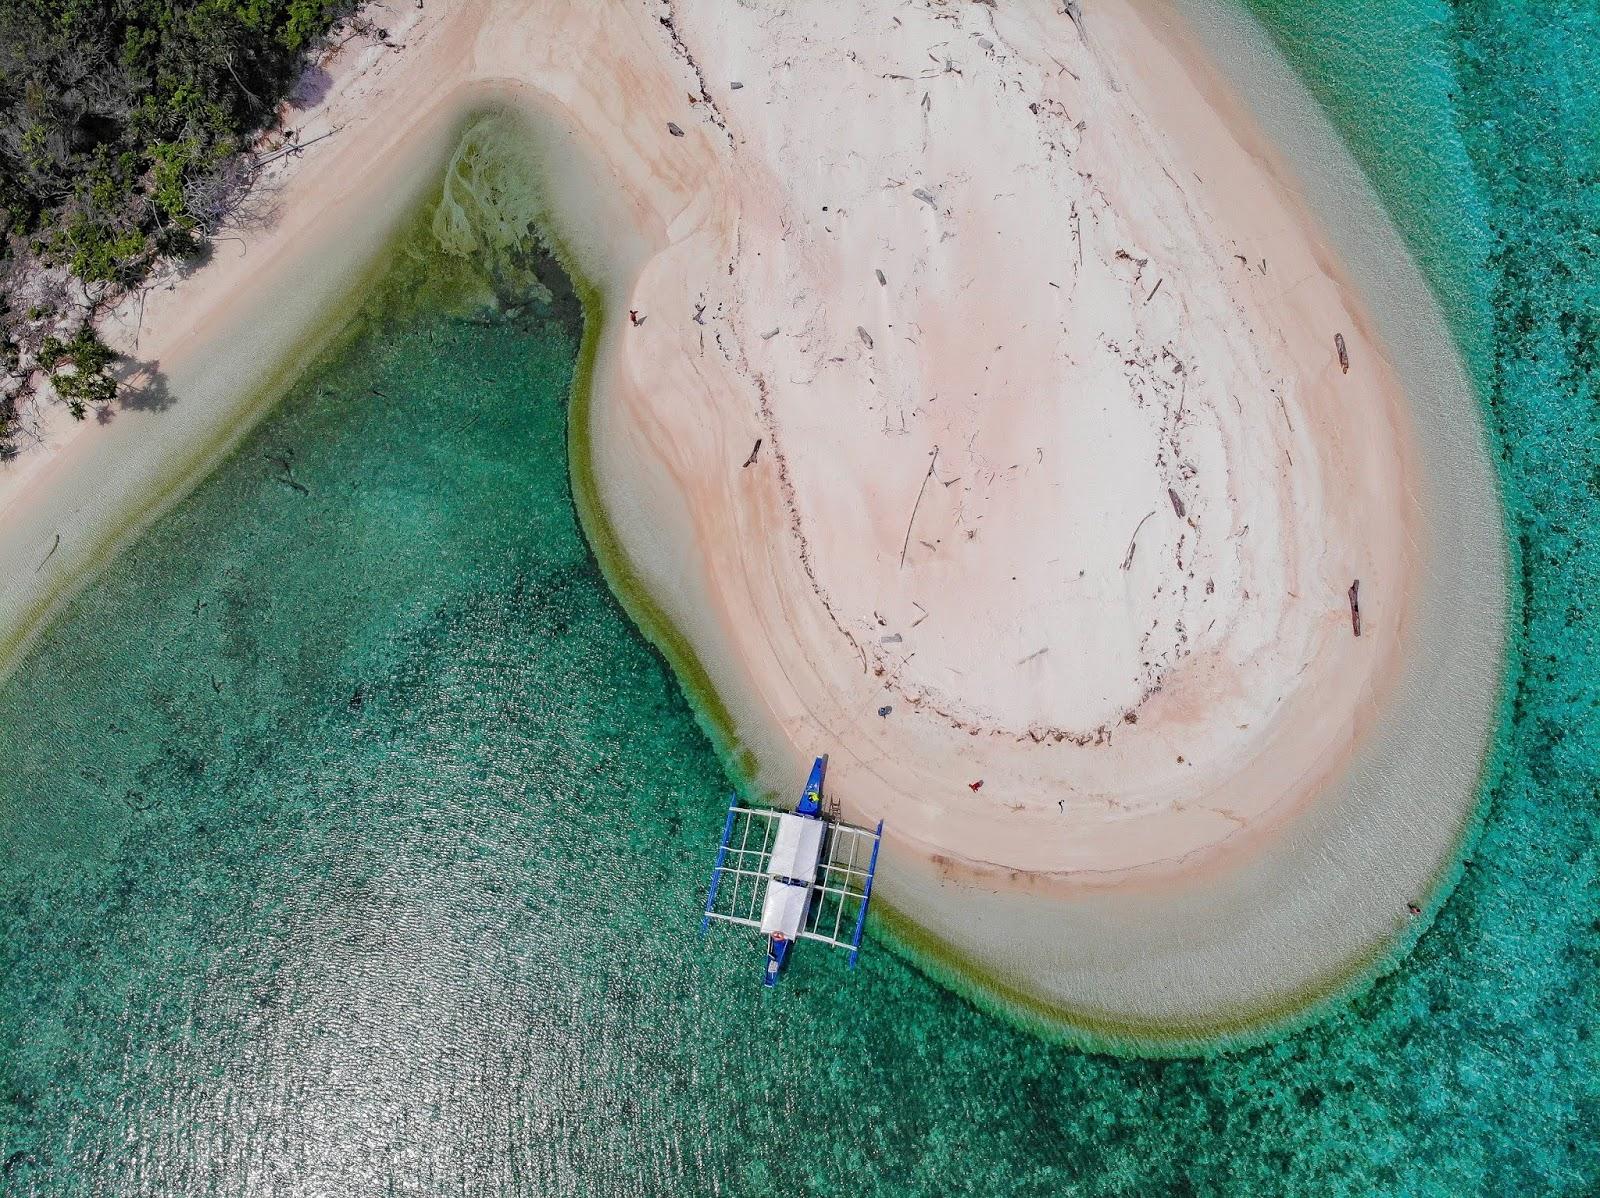 Palawan, Balabac, travel guide, what to do in Balabac, island hopping in Balabac, Philippines, Luzon, travel, Balabac travel guide, 4D/3N in Balabac, Balabac Itinerary, Balabac drone shot, mavic air,